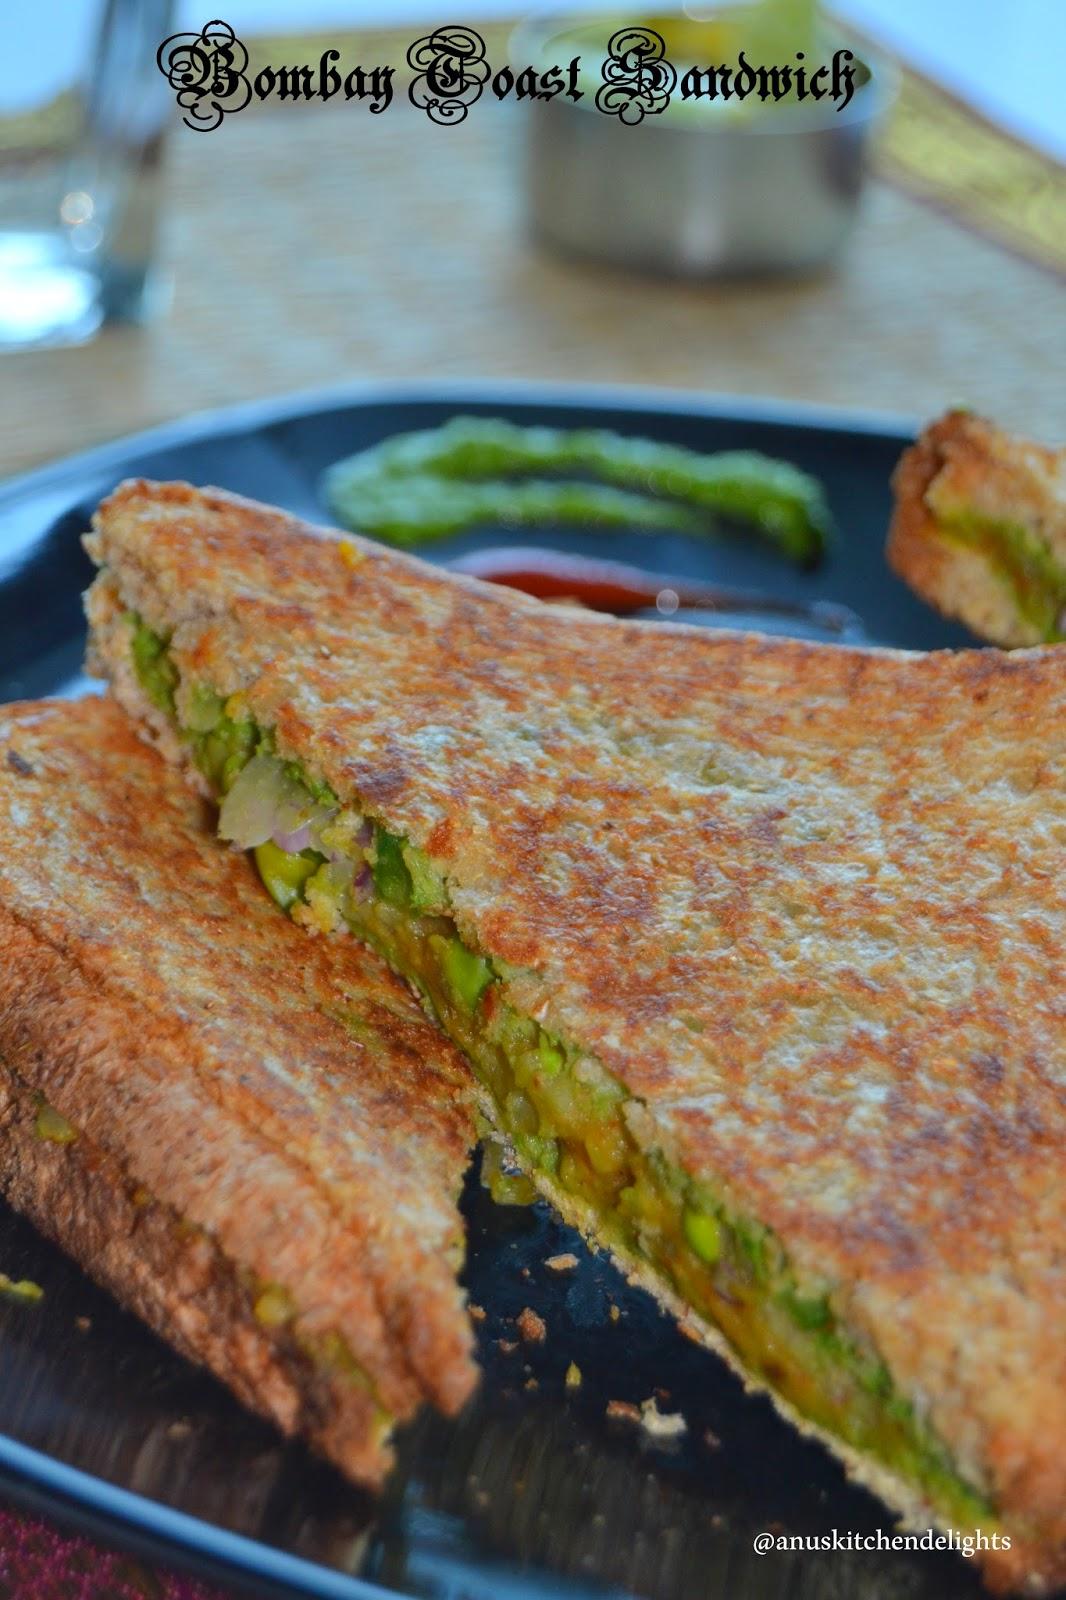 Bombay Toast Sandwich